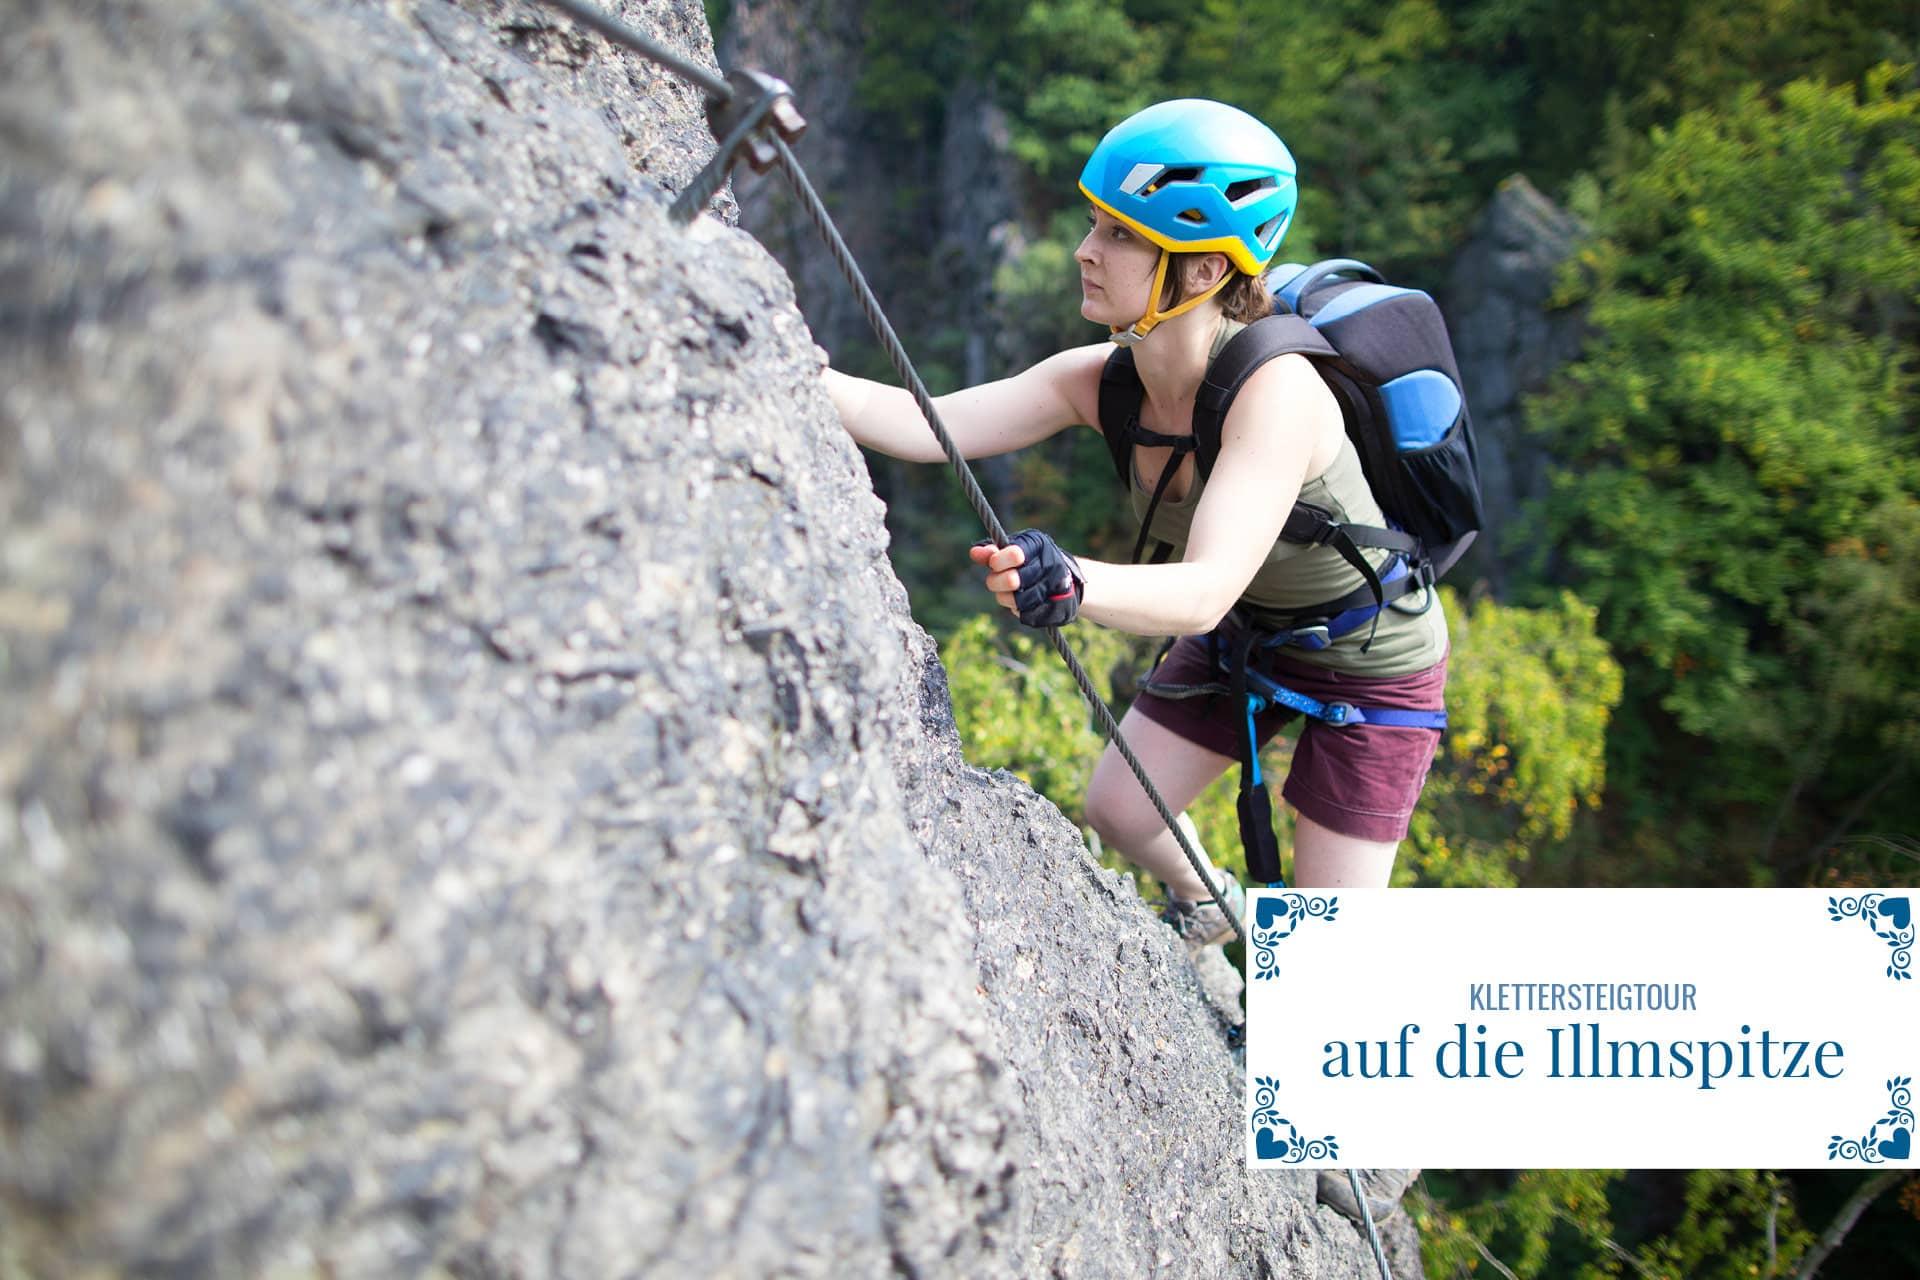 Sepp-und-Hannis-Stubaital-Sommerhighlight-Klettersteig-Aktivurlaub-Tirol